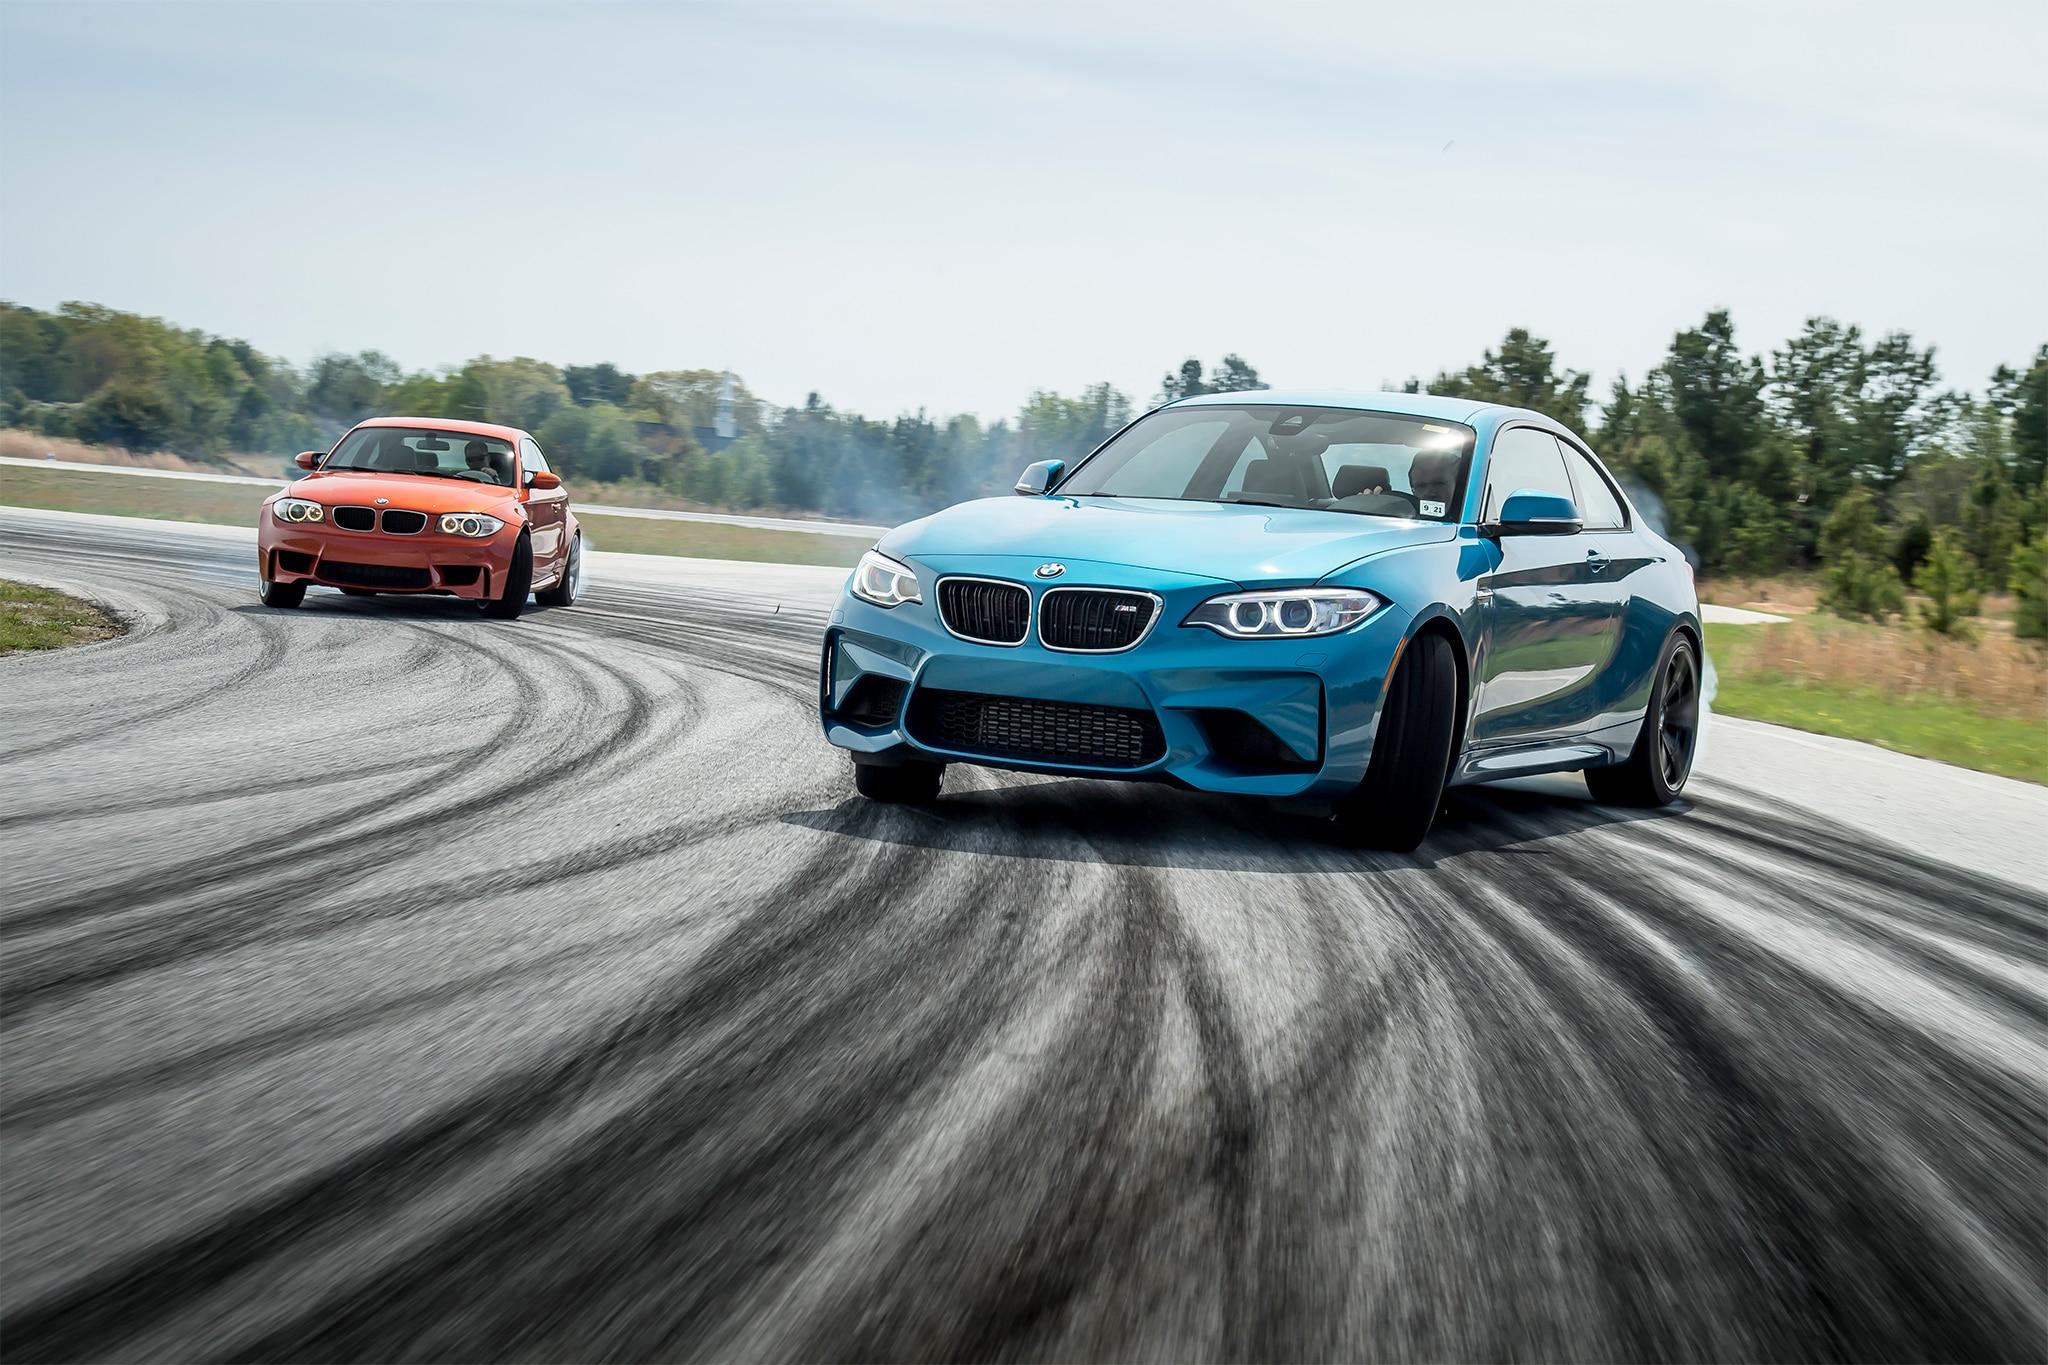 2 vs 1 Our Four Seasons BMW M2 Travels to the Carolinas